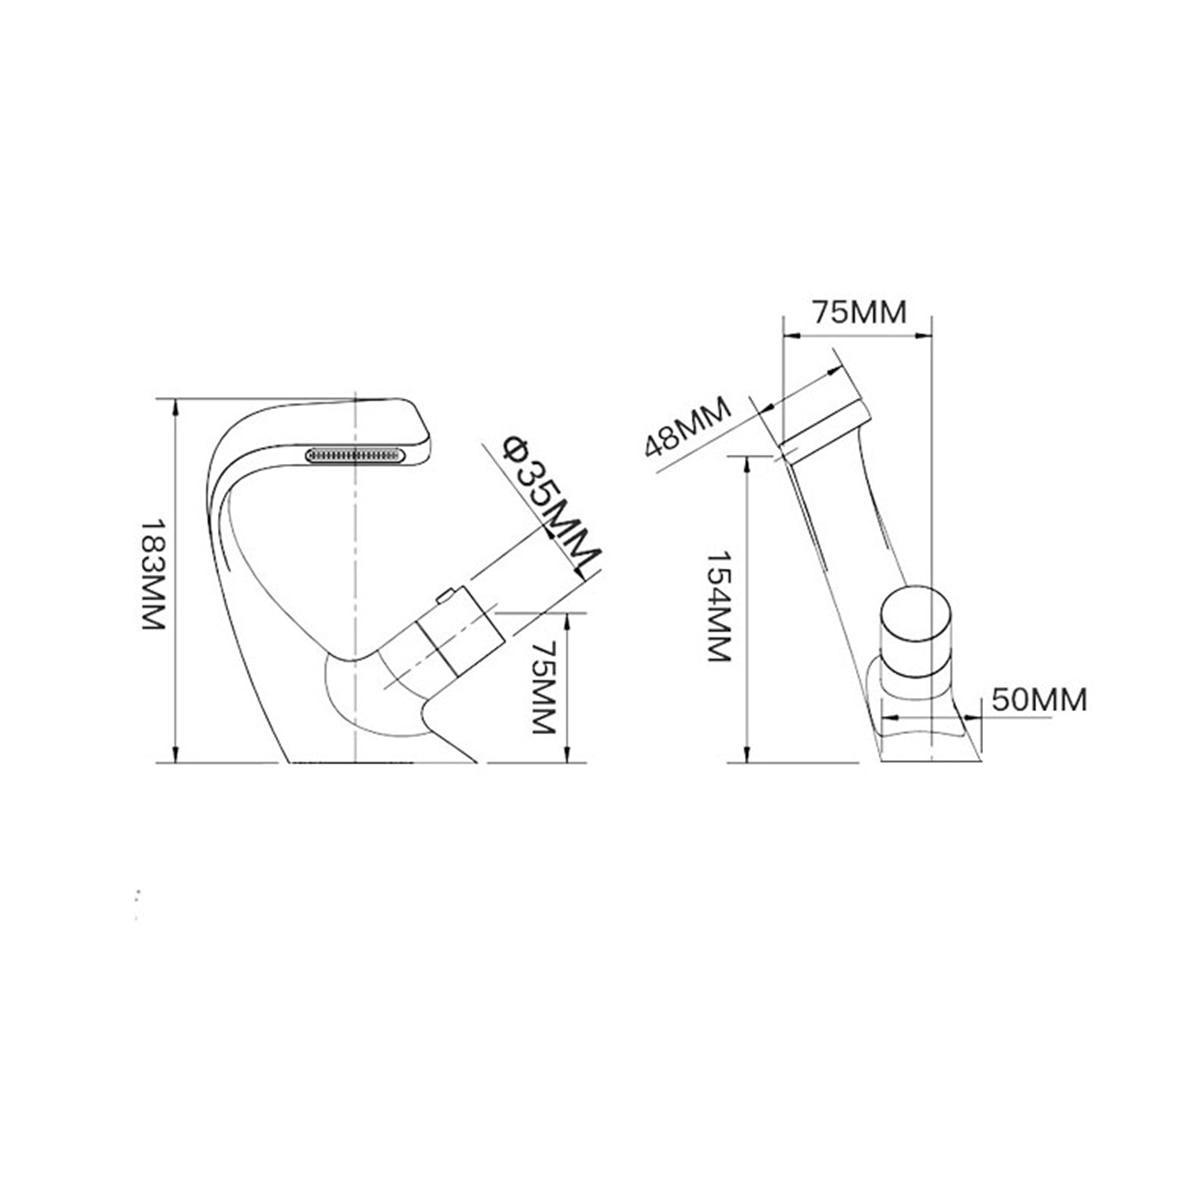 Hf6a6afa03b9c41d4aba687affead99bam Black Faucet Bathroom Sink Faucets Hot Cold Water Mixer Crane Deck Mounted Single Hole Bath Tap Chrome Finished